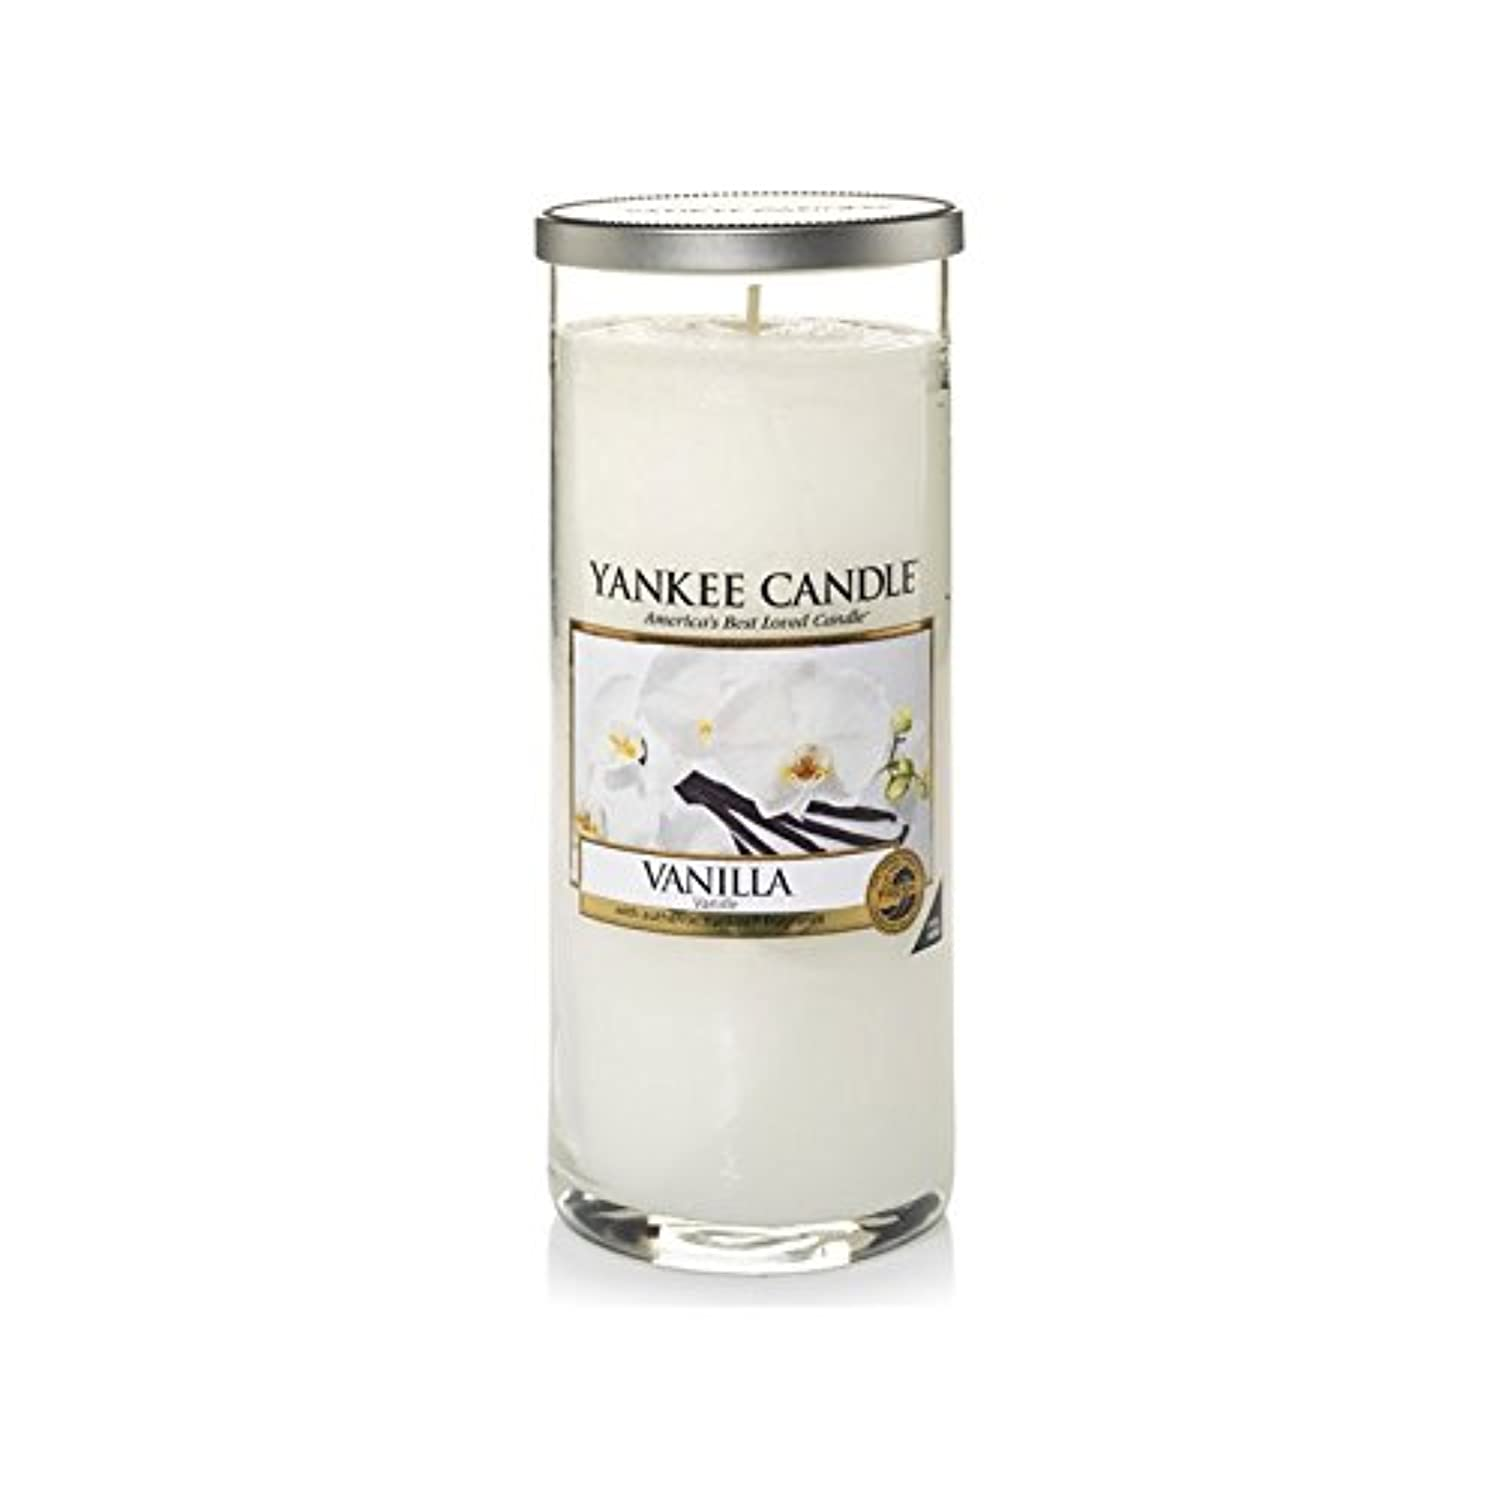 Yankee Candles Large Pillar Candle - Vanilla (Pack of 2) - ヤンキーキャンドル大きな柱キャンドル - バニラ (x2) [並行輸入品]